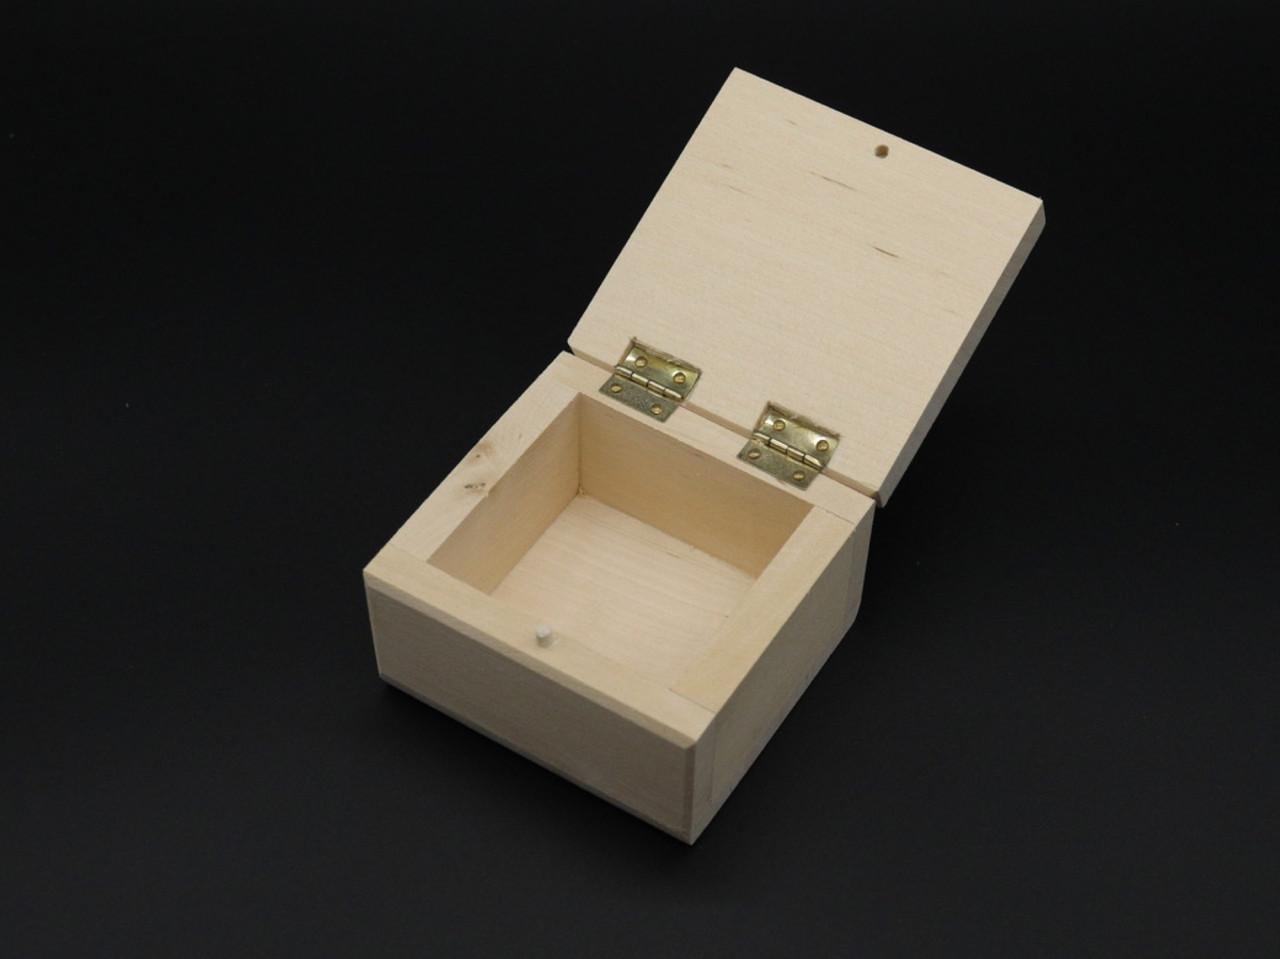 Скринька(заговка) +петлі. 8*8см. Матеріал береза.